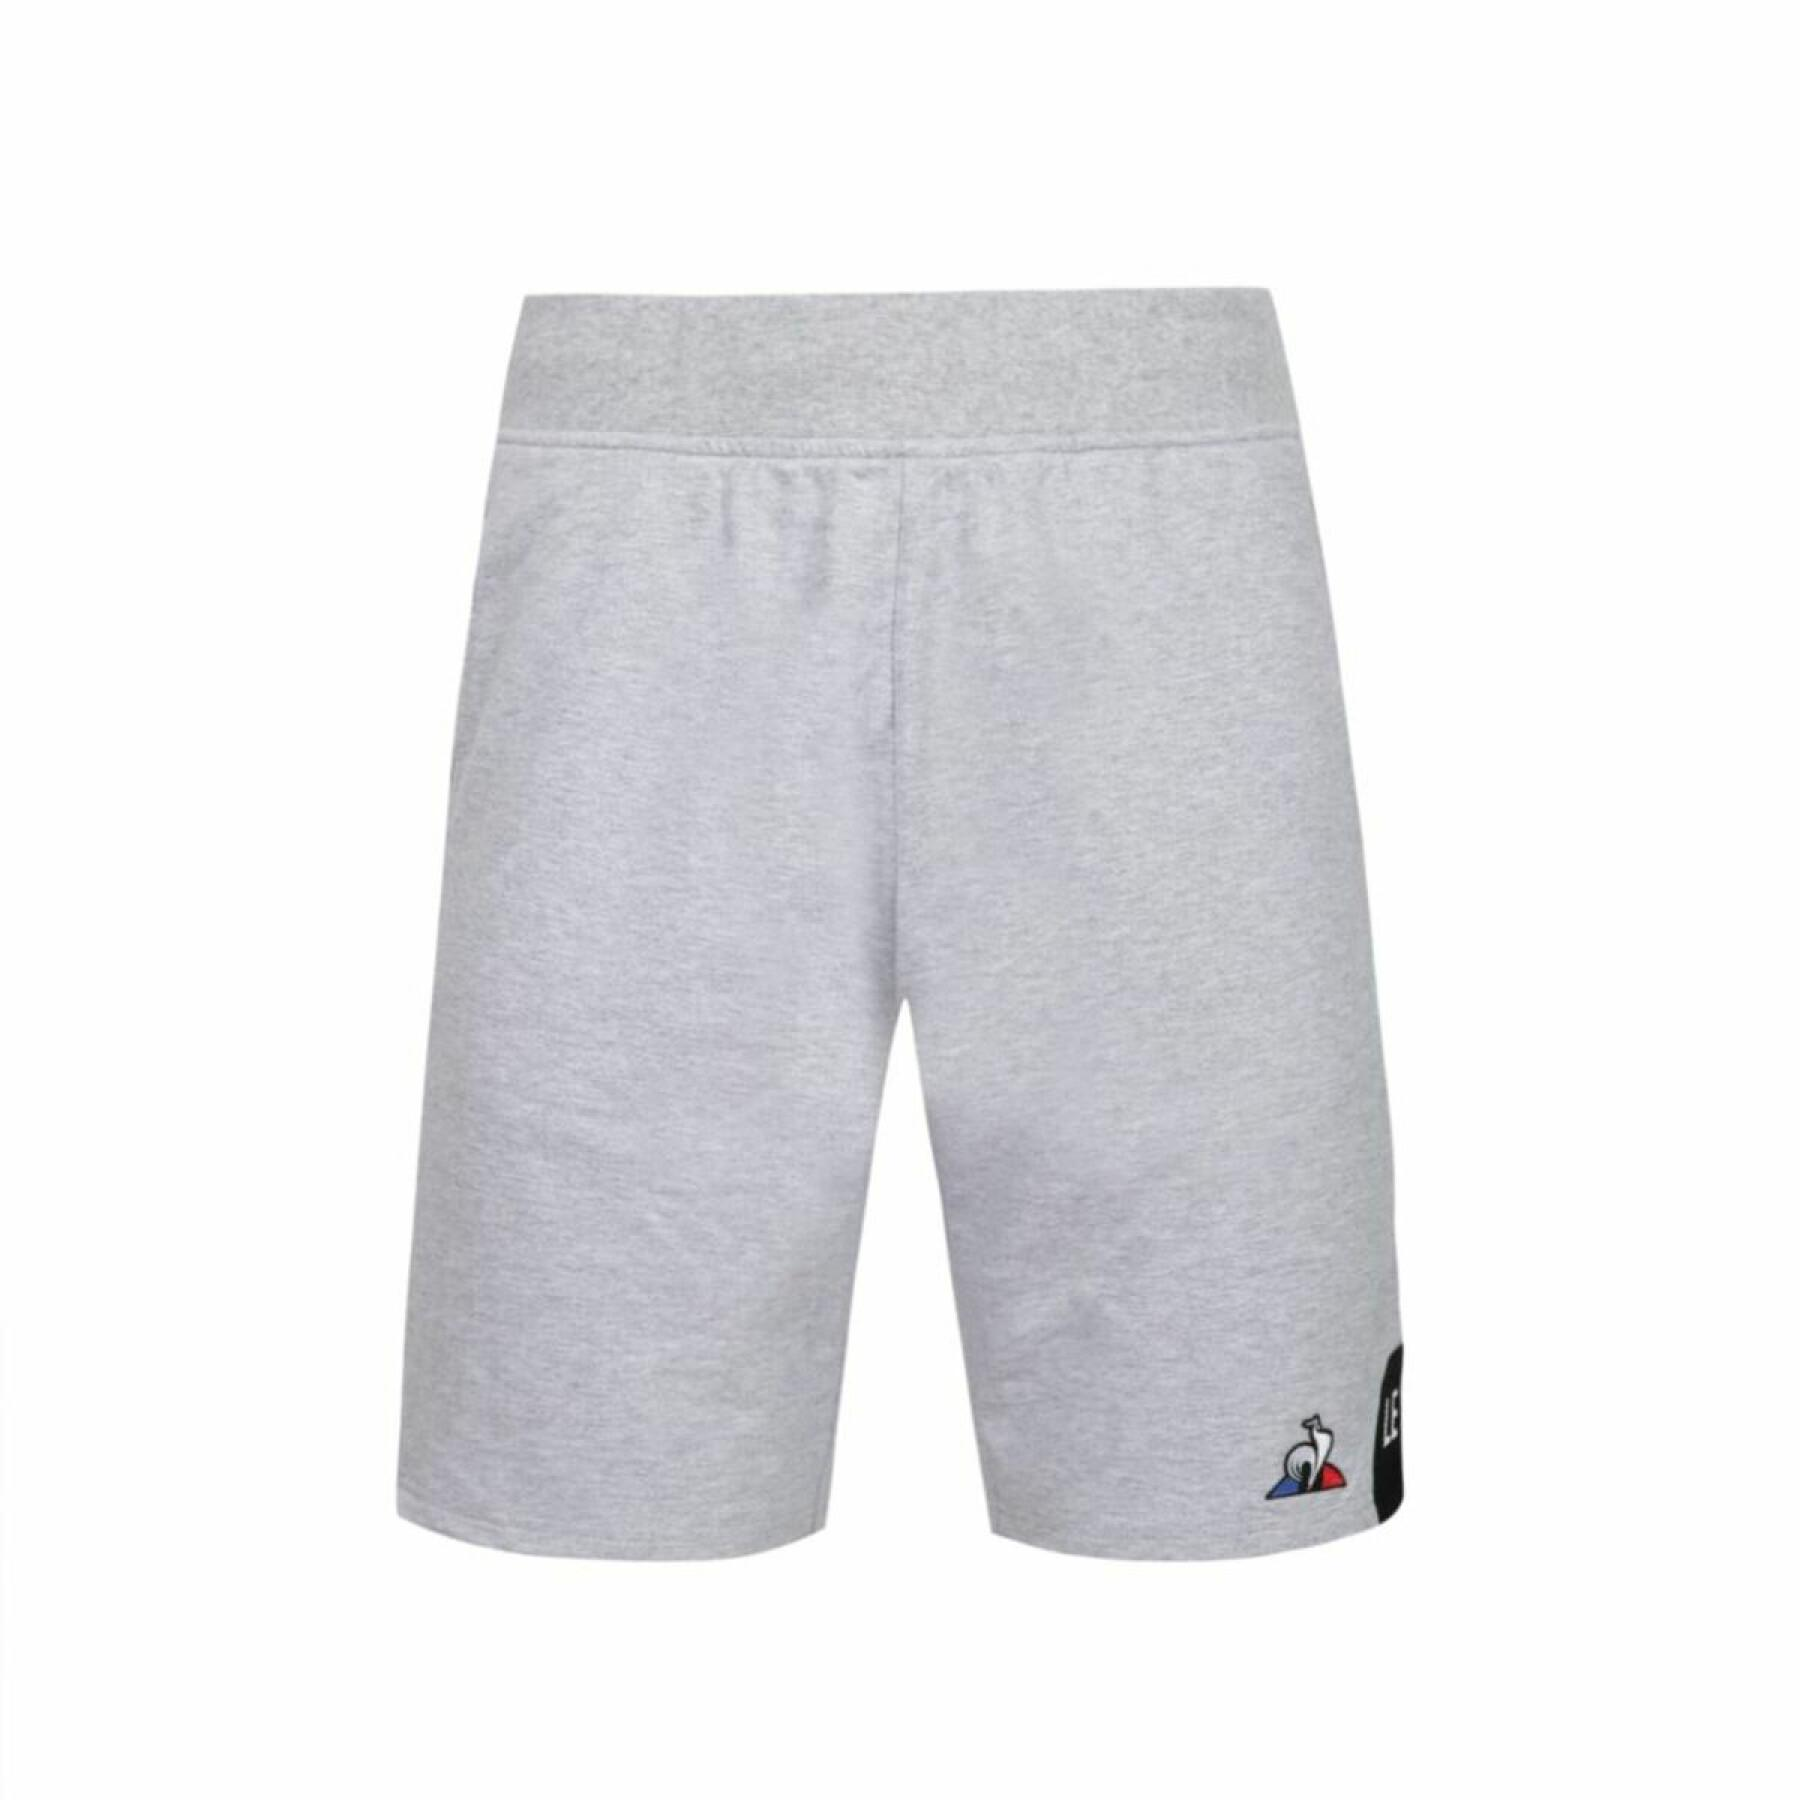 Le Coq Sportif essential shorts regular n°2